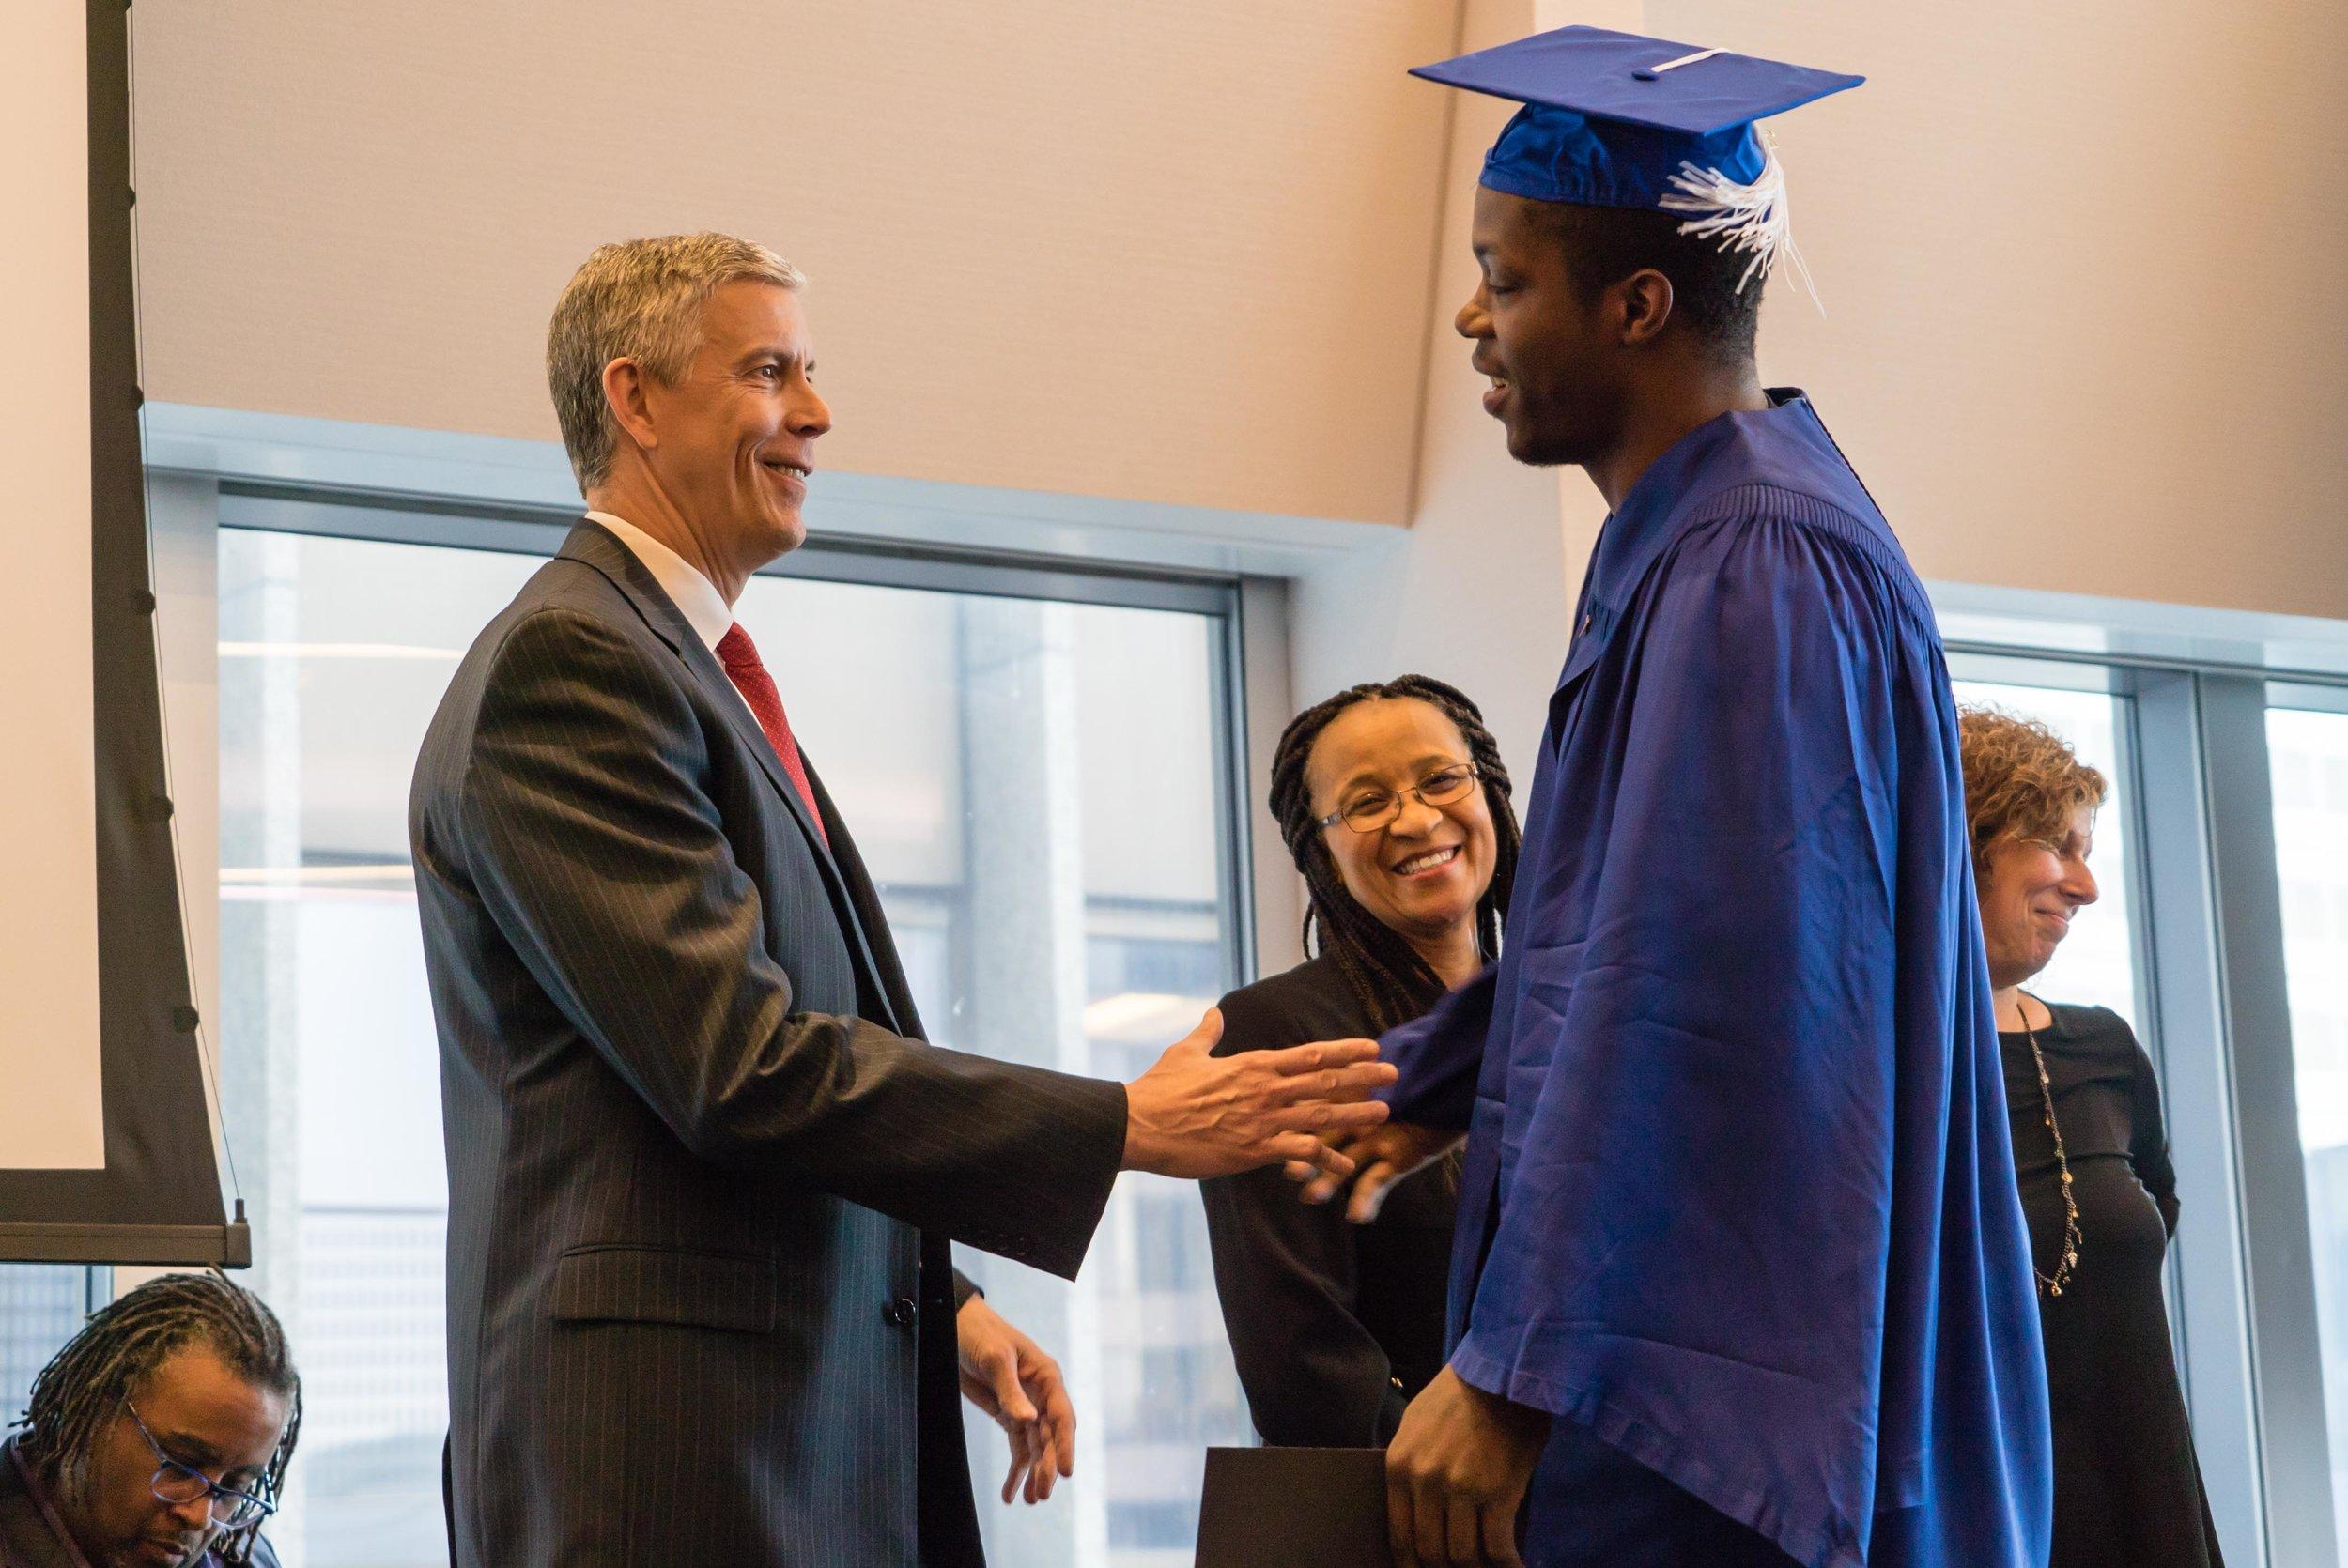 CRED_Graduation_Chicago_04062018-26-2.jpg